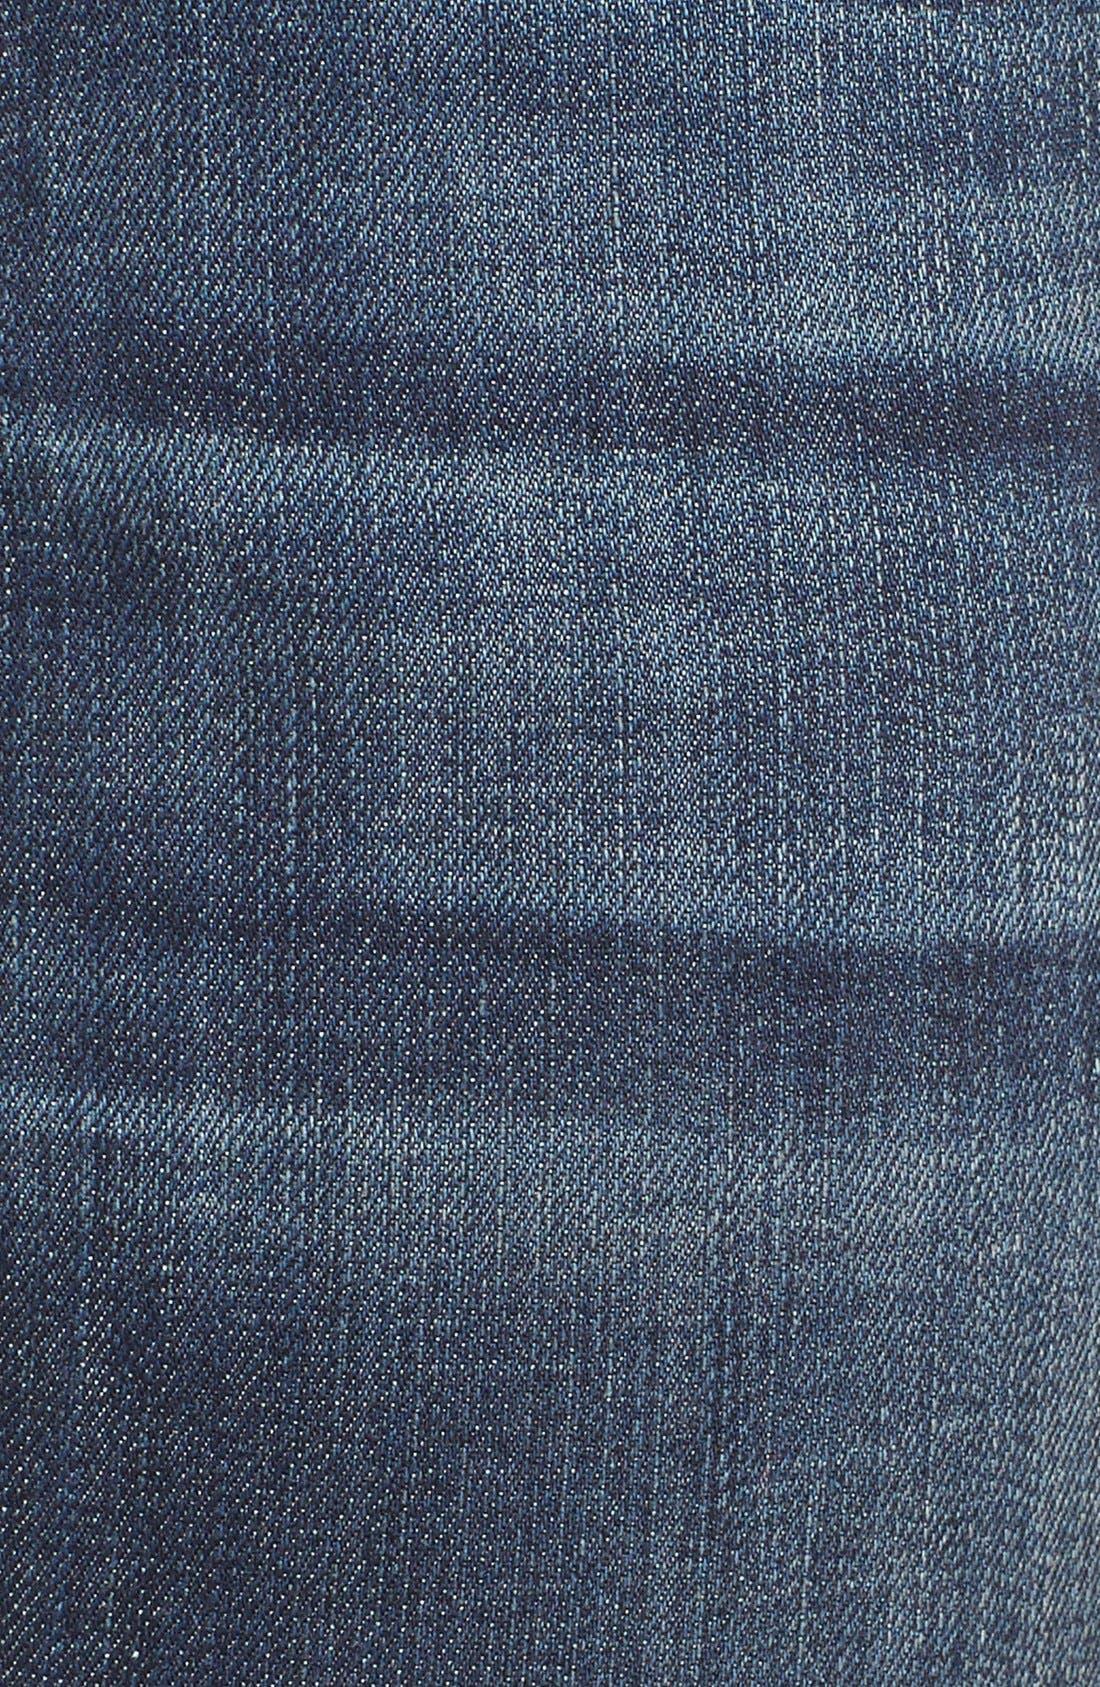 Alternate Image 5  - True Religion Brand Jeans 'Becca' Twisted Seam Bootcut Jeans (Boyfriend Wash)